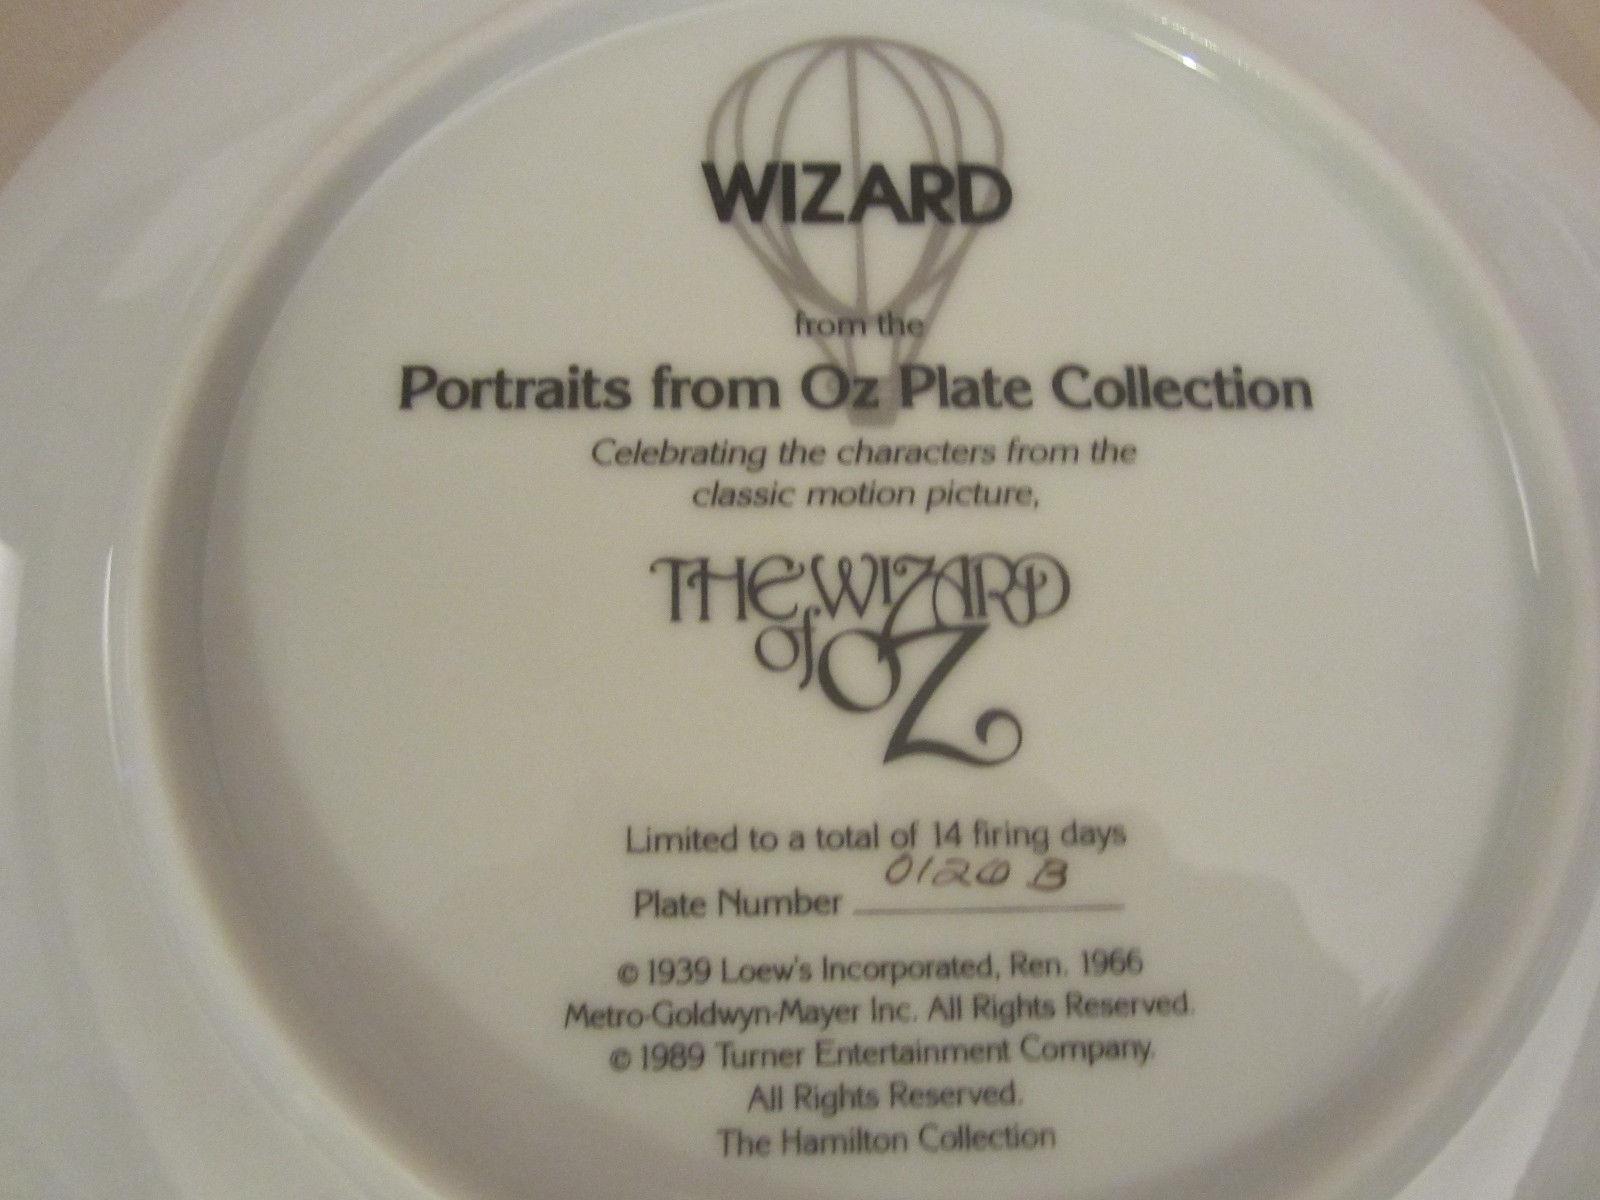 WIZARD collector plate WIZARD OF OZ PORTRAITS Thomas Blackshear